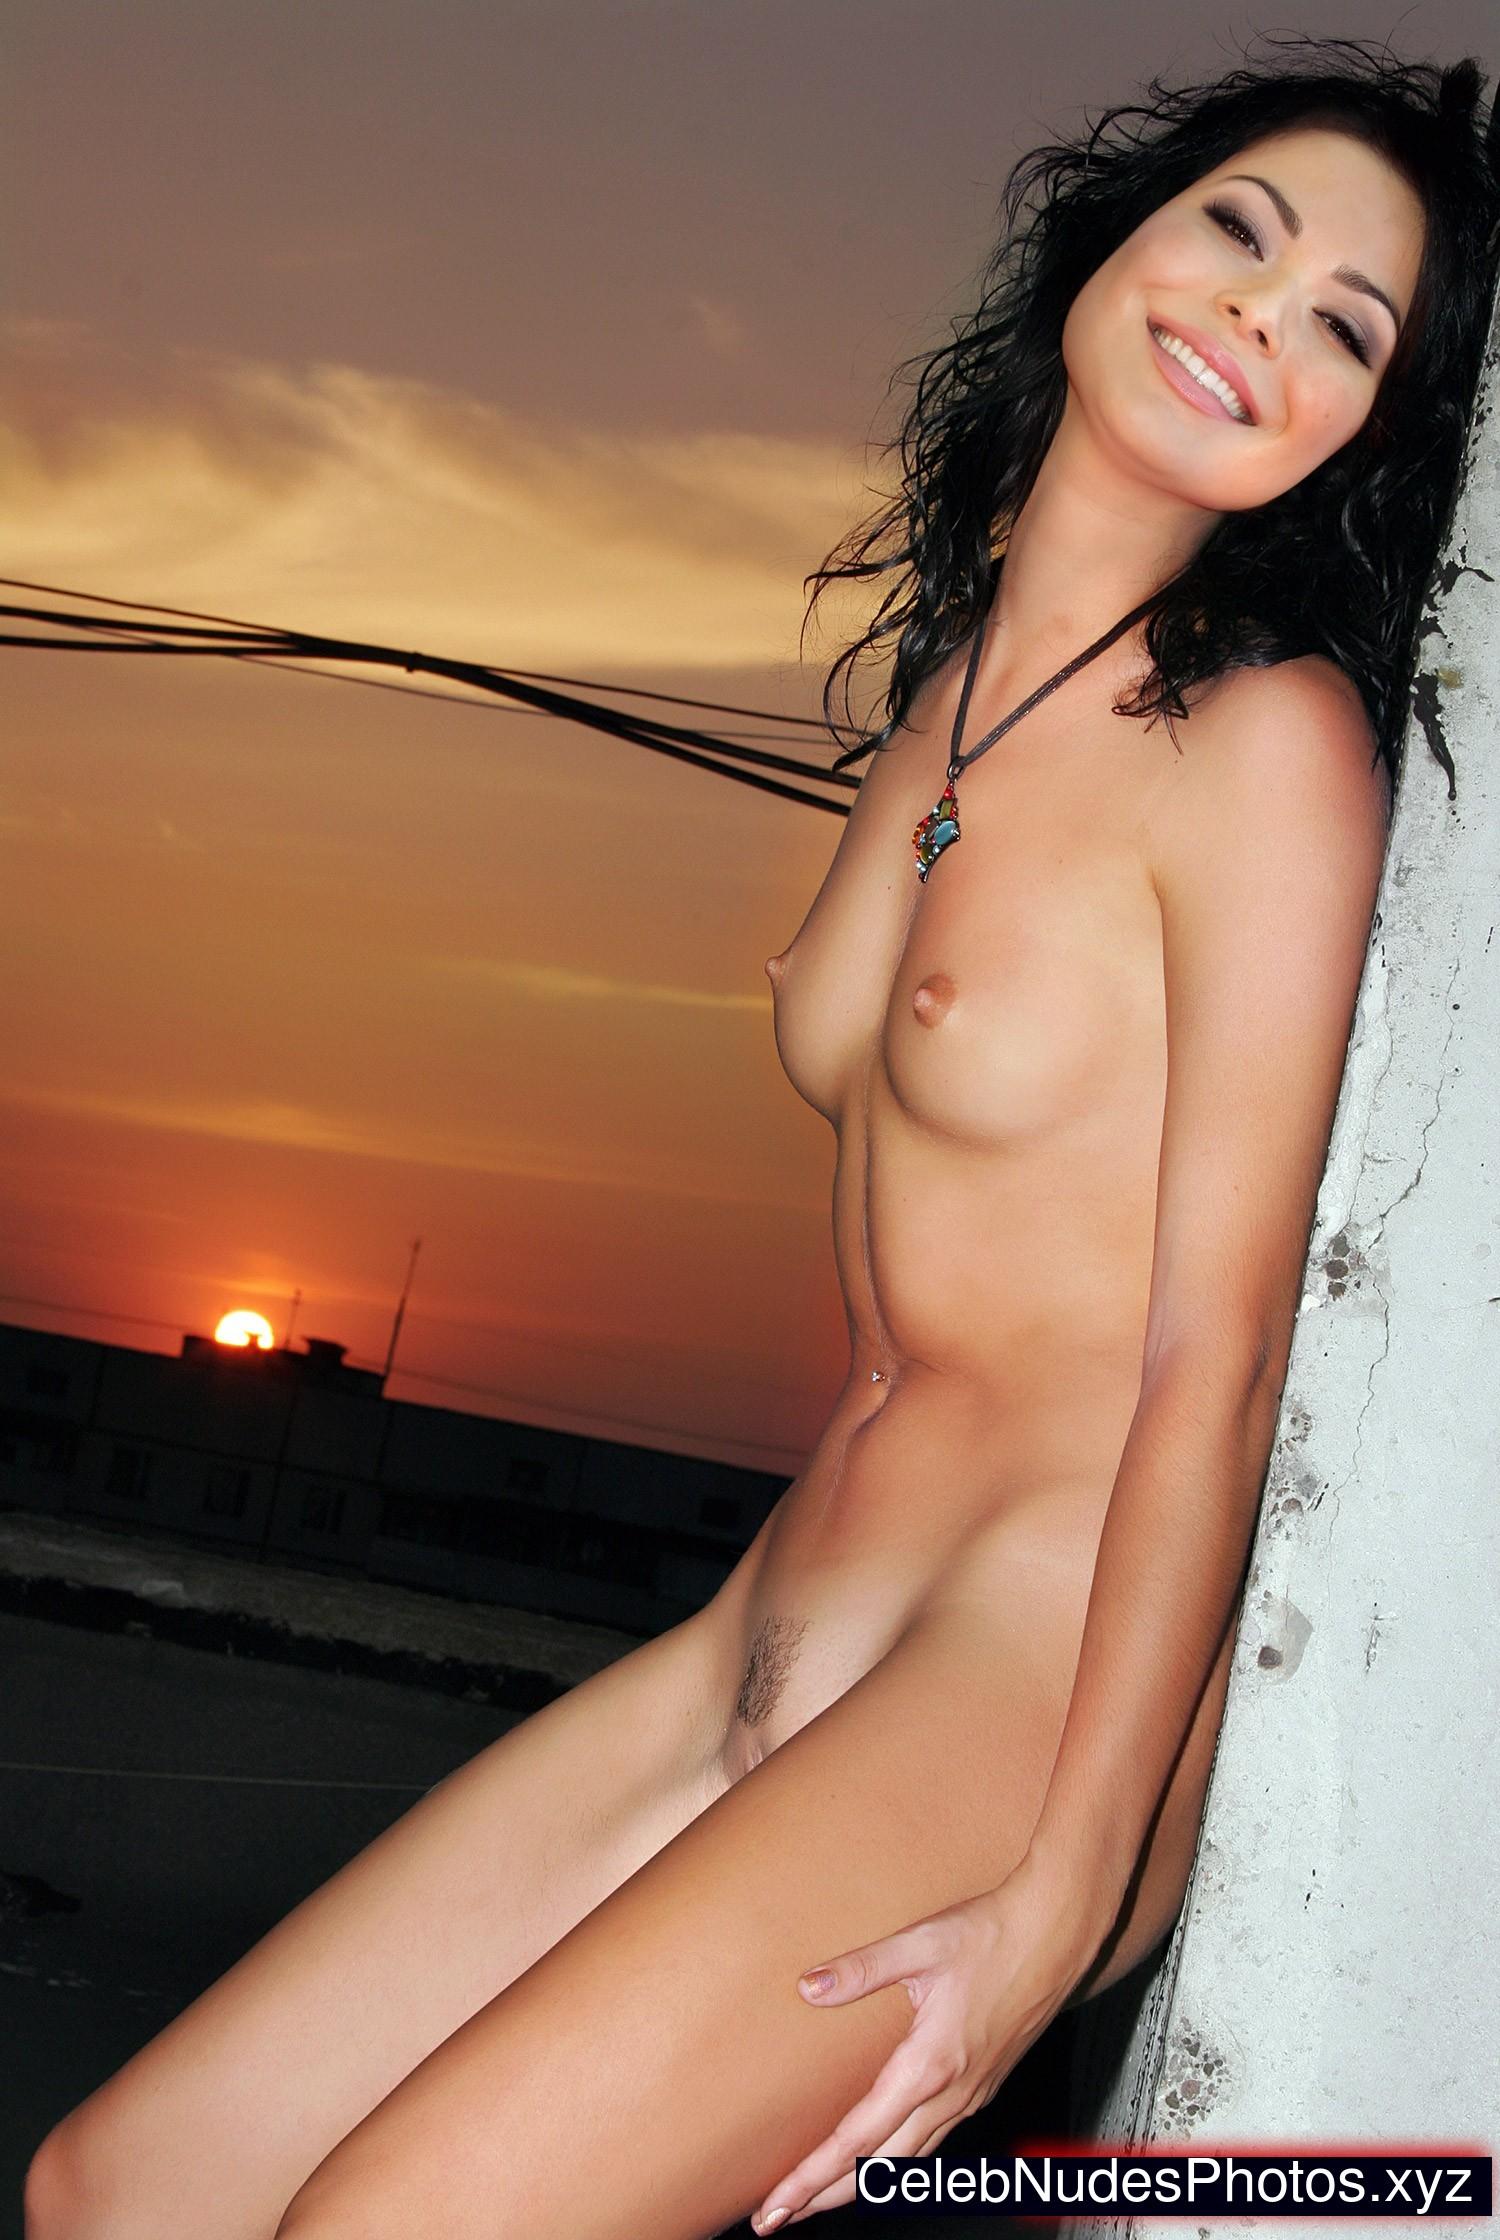 miranda cosgrove naked galleries